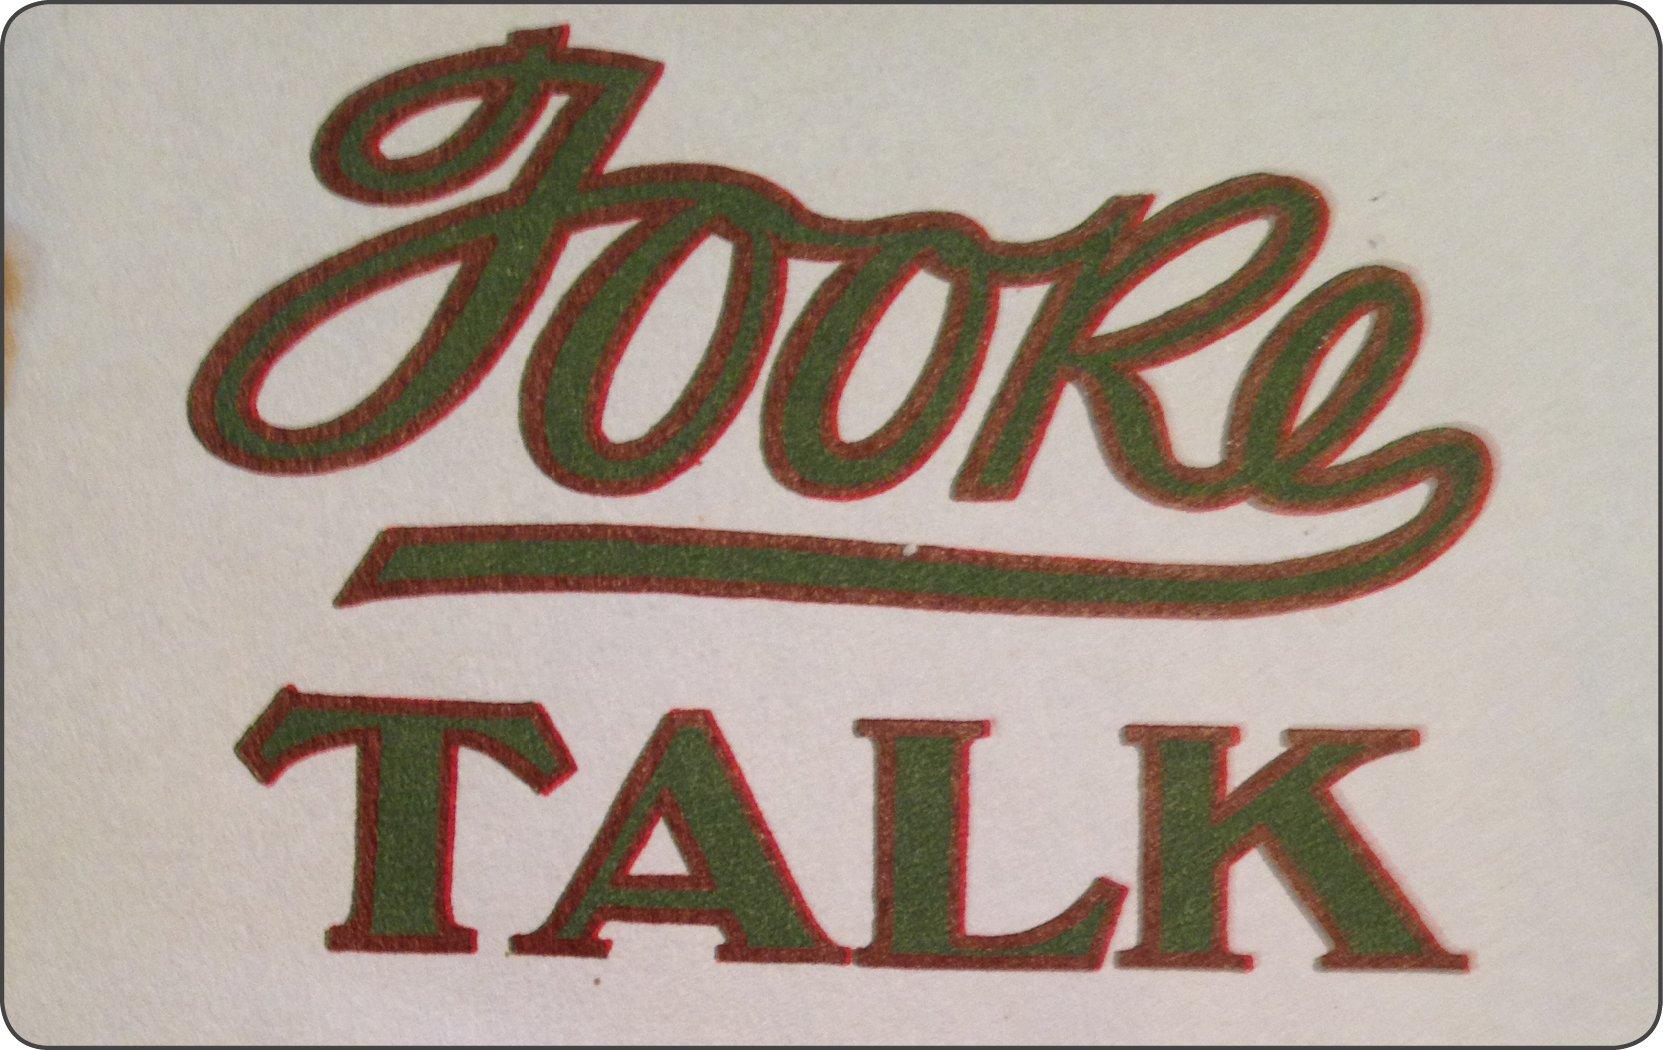 Tooke Talk by Tooke Brothers Ltd.